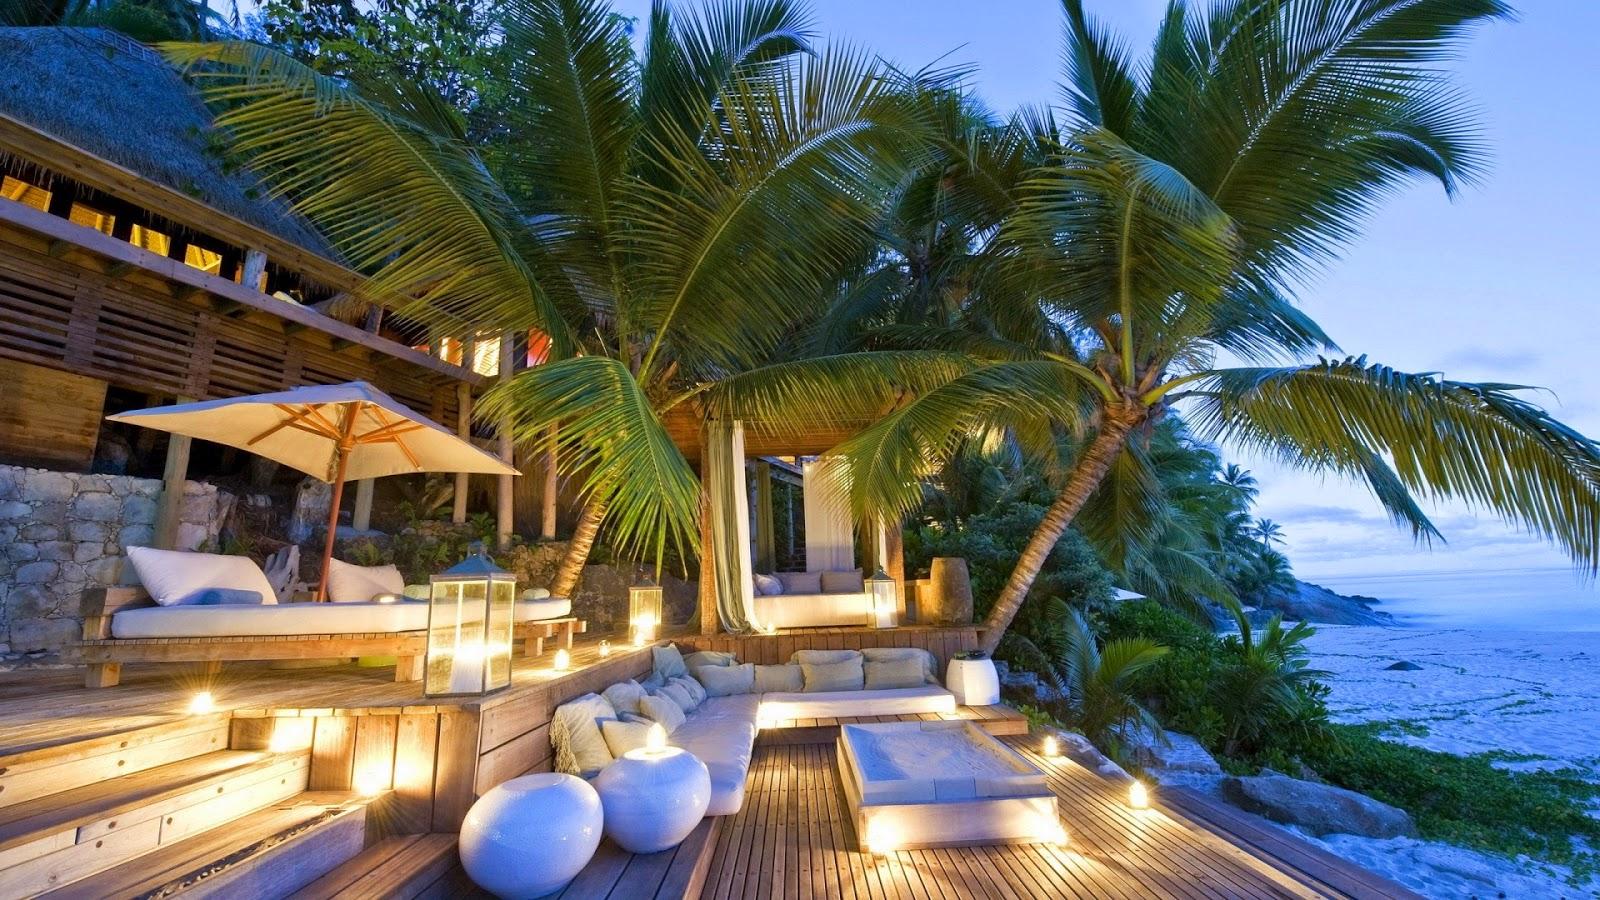 Tropical Island Getaways: Tropical Honeymoon Destinations